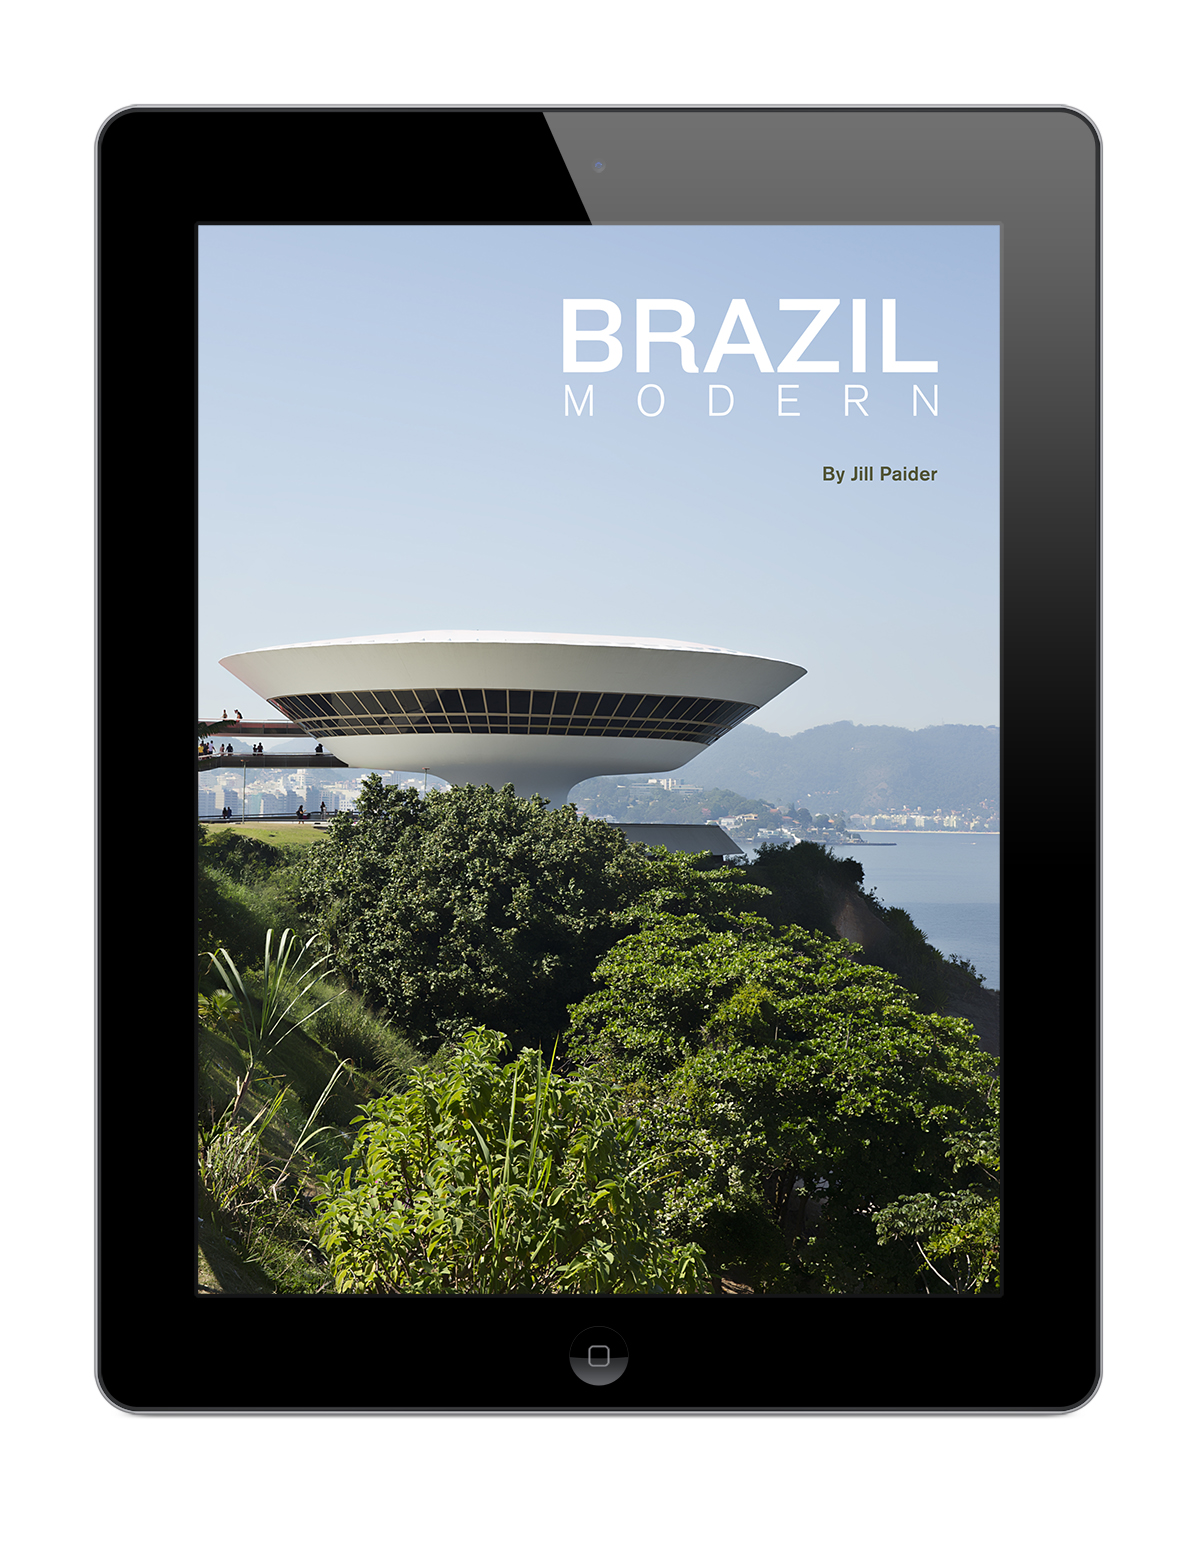 BRAZIL MODERN - COMING SOON!